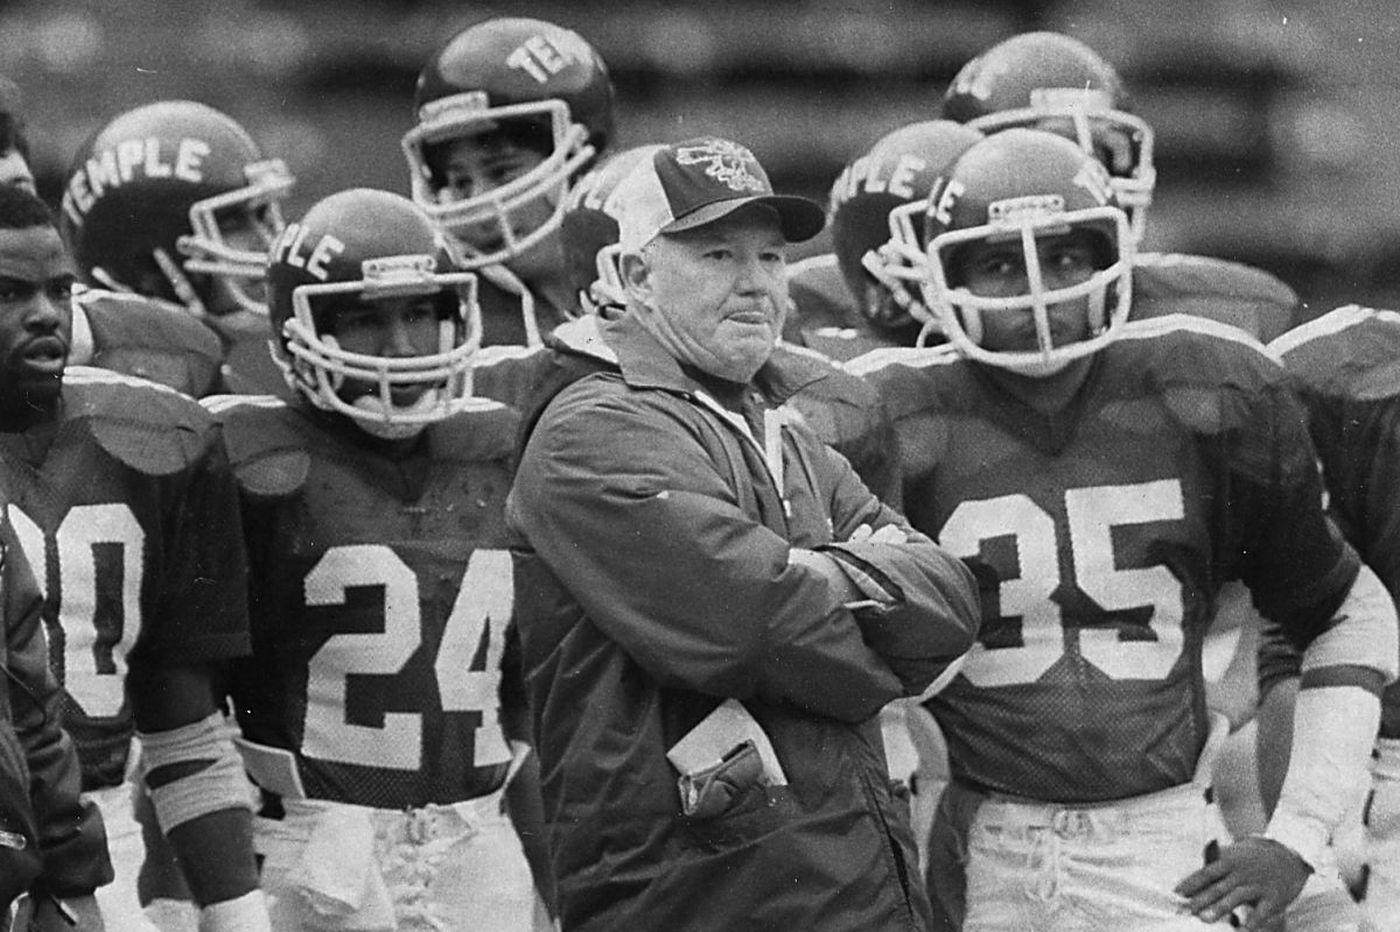 Wayne Hardin, former Temple football coach, dies at 91